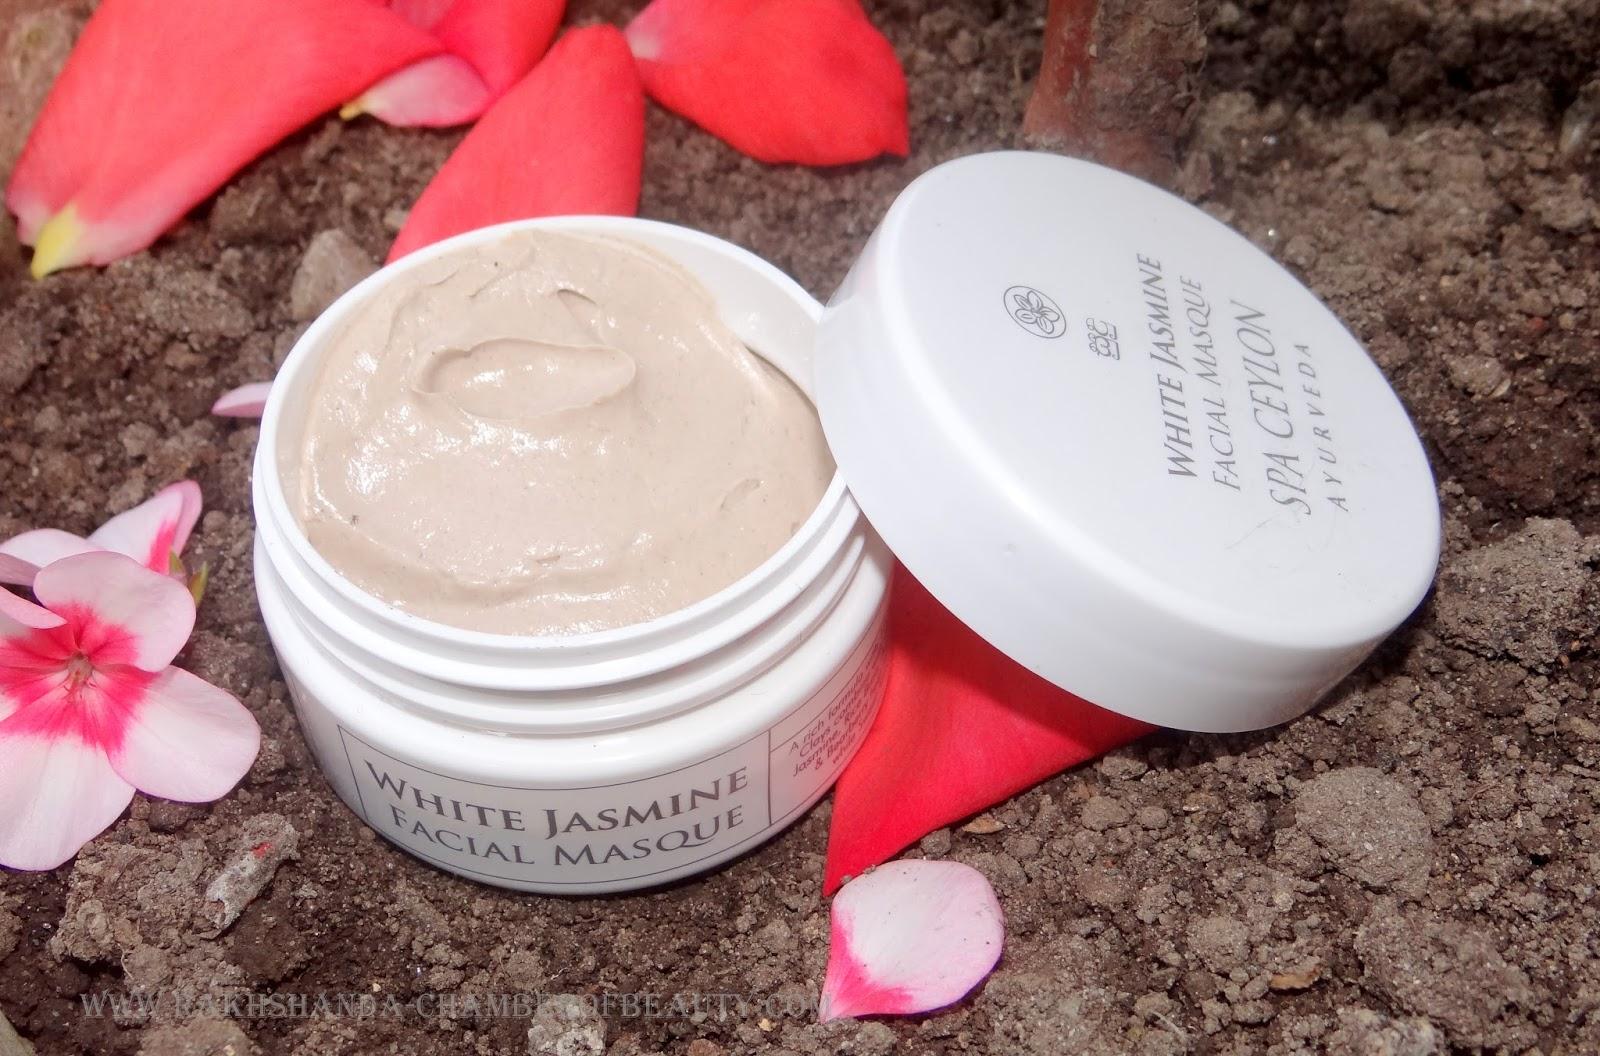 Spa Ceylon White Jasmine Face Masque Review & Price in India